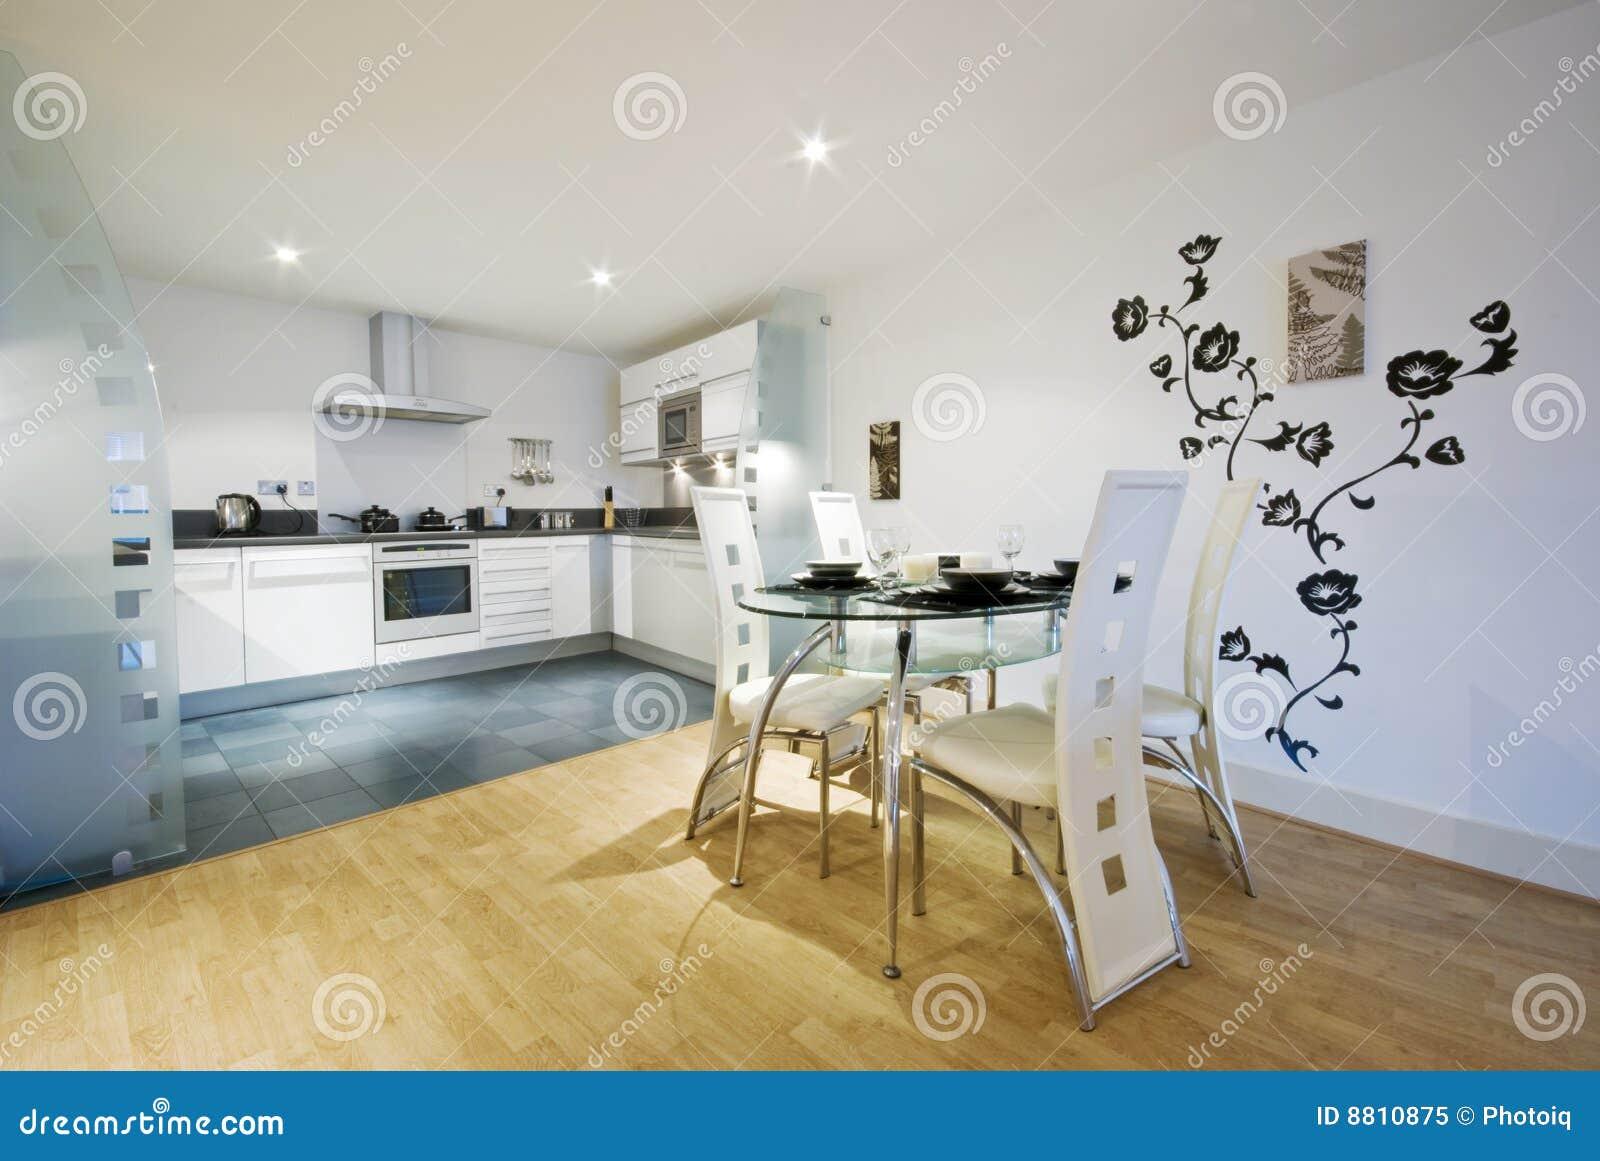 Arredare Cucina Sala Da Pranzo | madgeweb.com idee di interior design